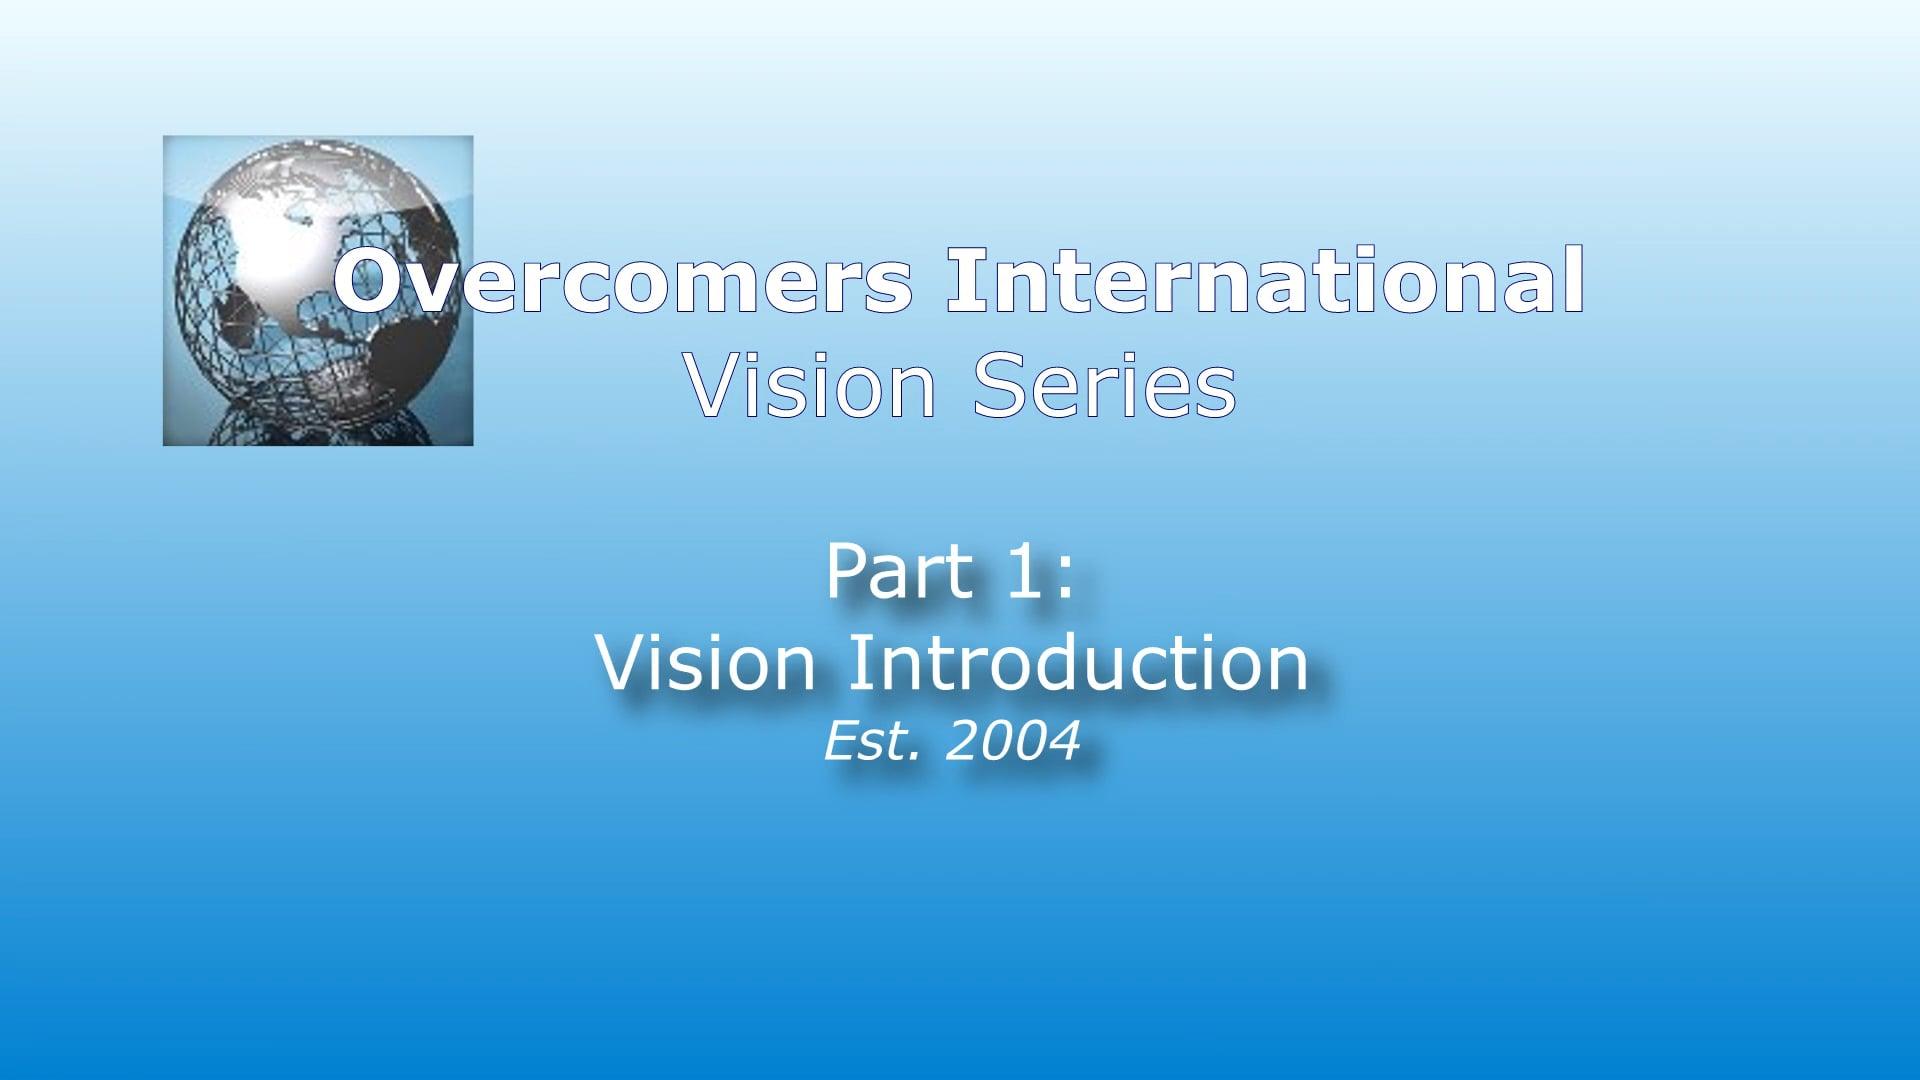 Vision of Overcomers International